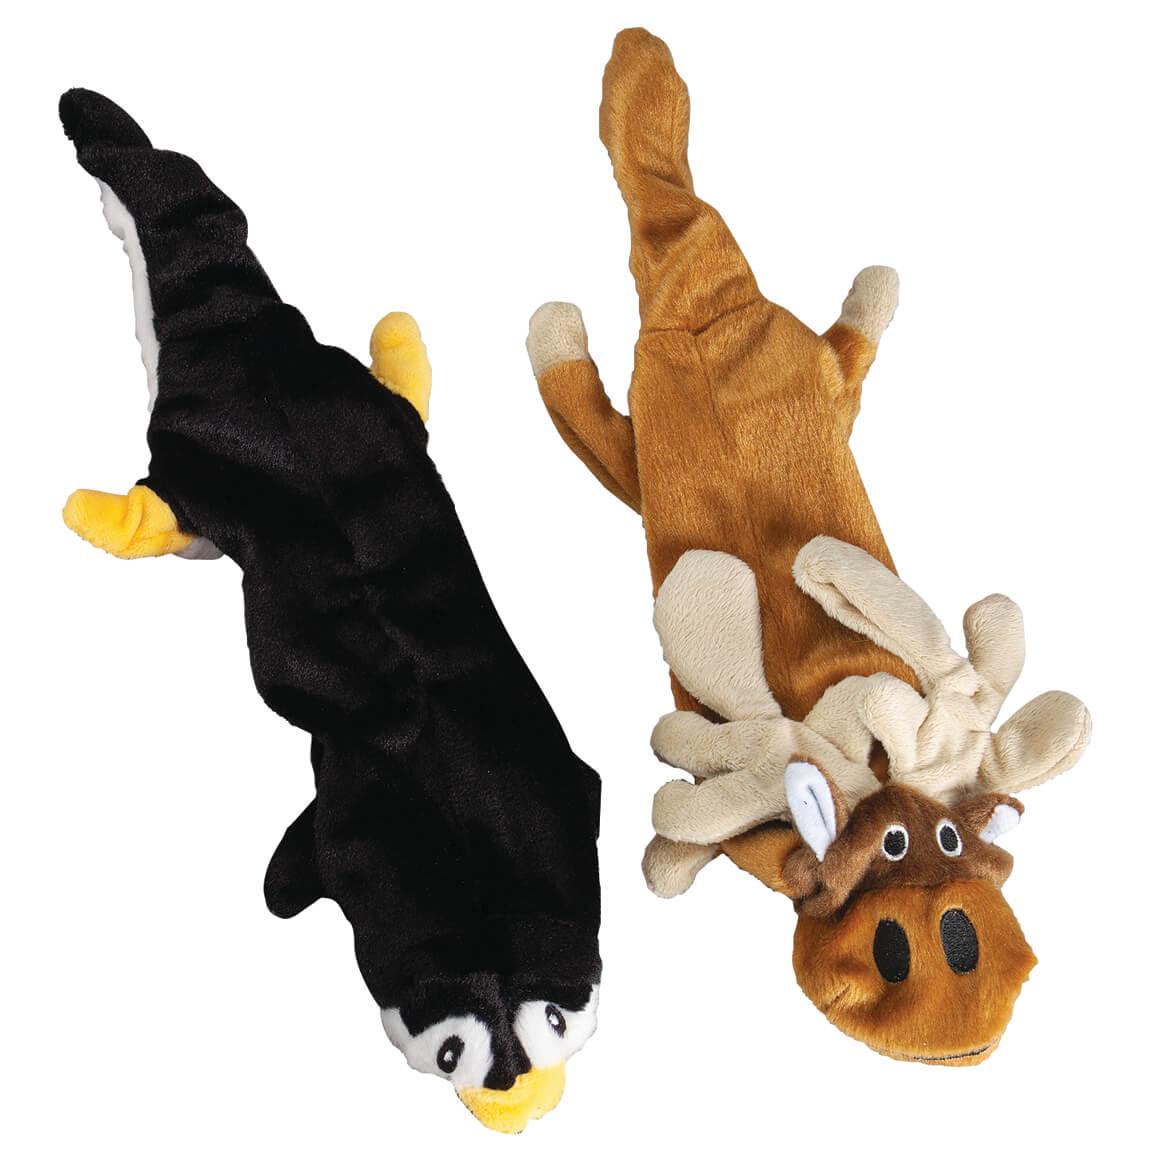 Animal Stuffing Free Dog Toys, Set of 2-370662